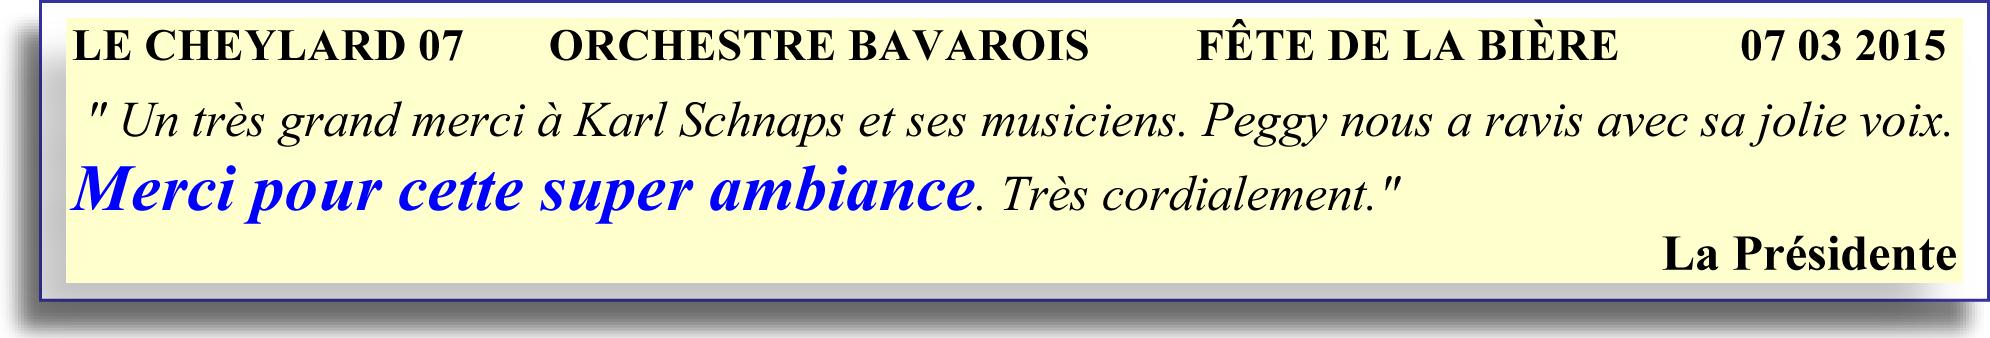 07-03-2015 – LE CHEYLARD 07